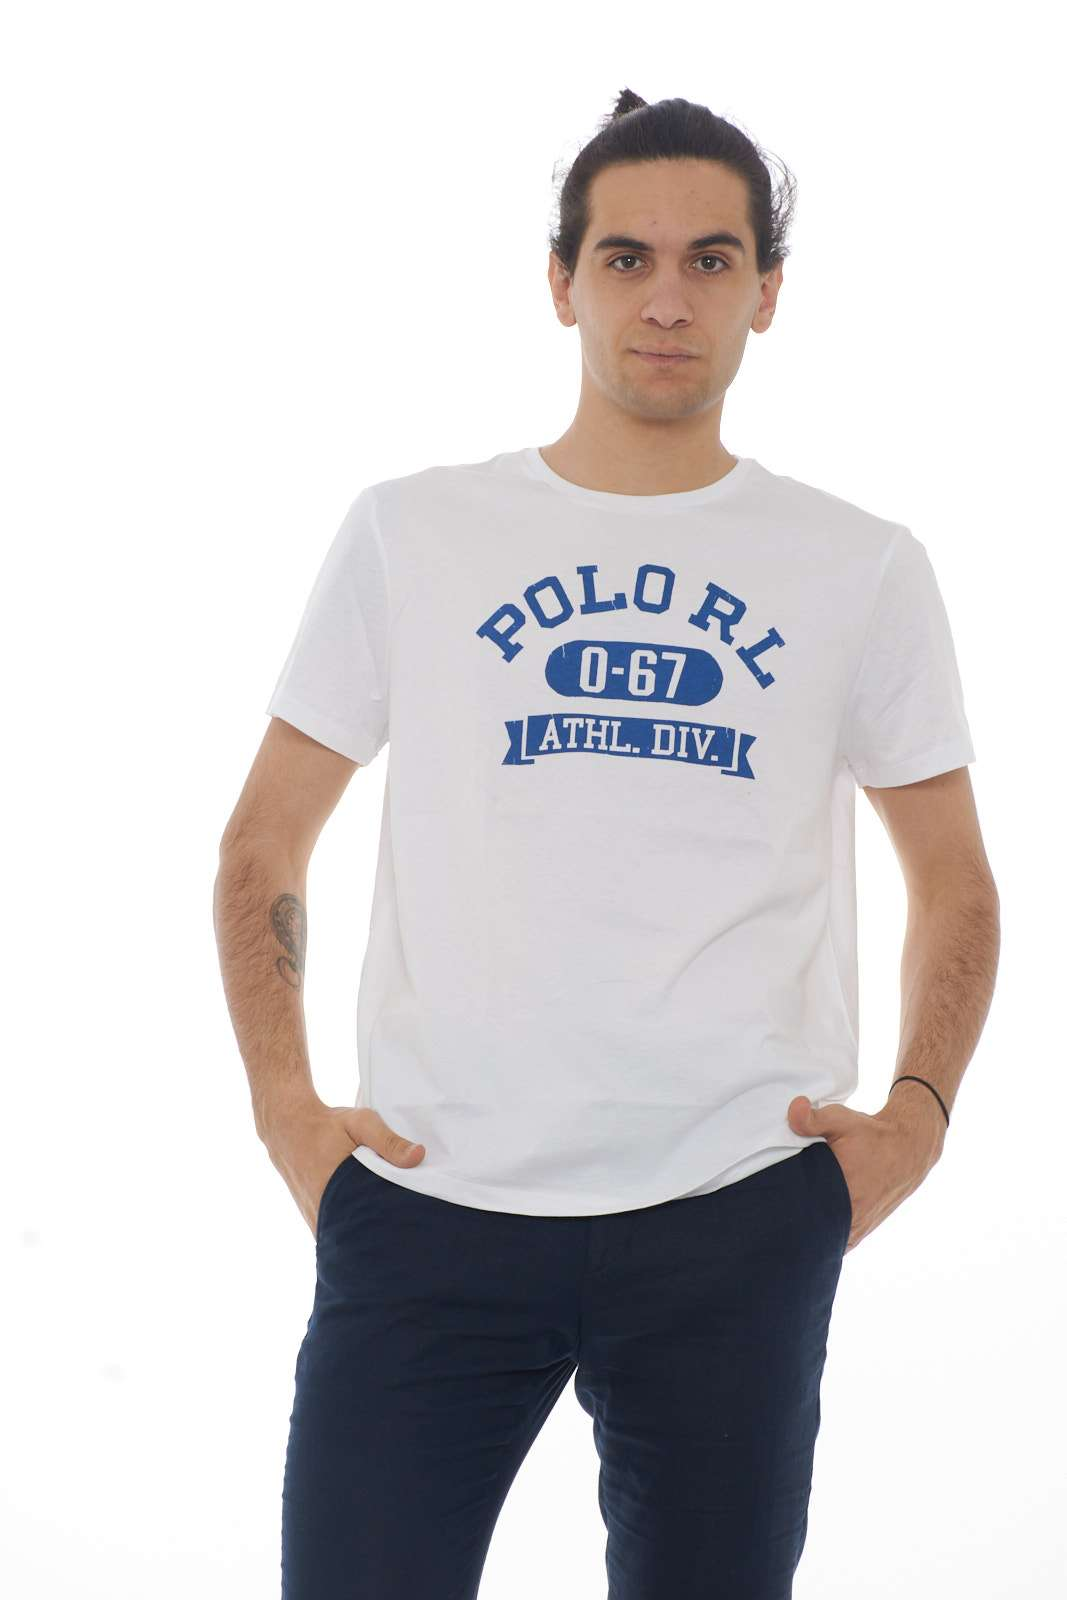 https://www.parmax.com/media/catalog/product/a/i/PE-outlet_parmax-t-shirt-uomo-Polo-ralph-Lauren-710740968-A.jpg